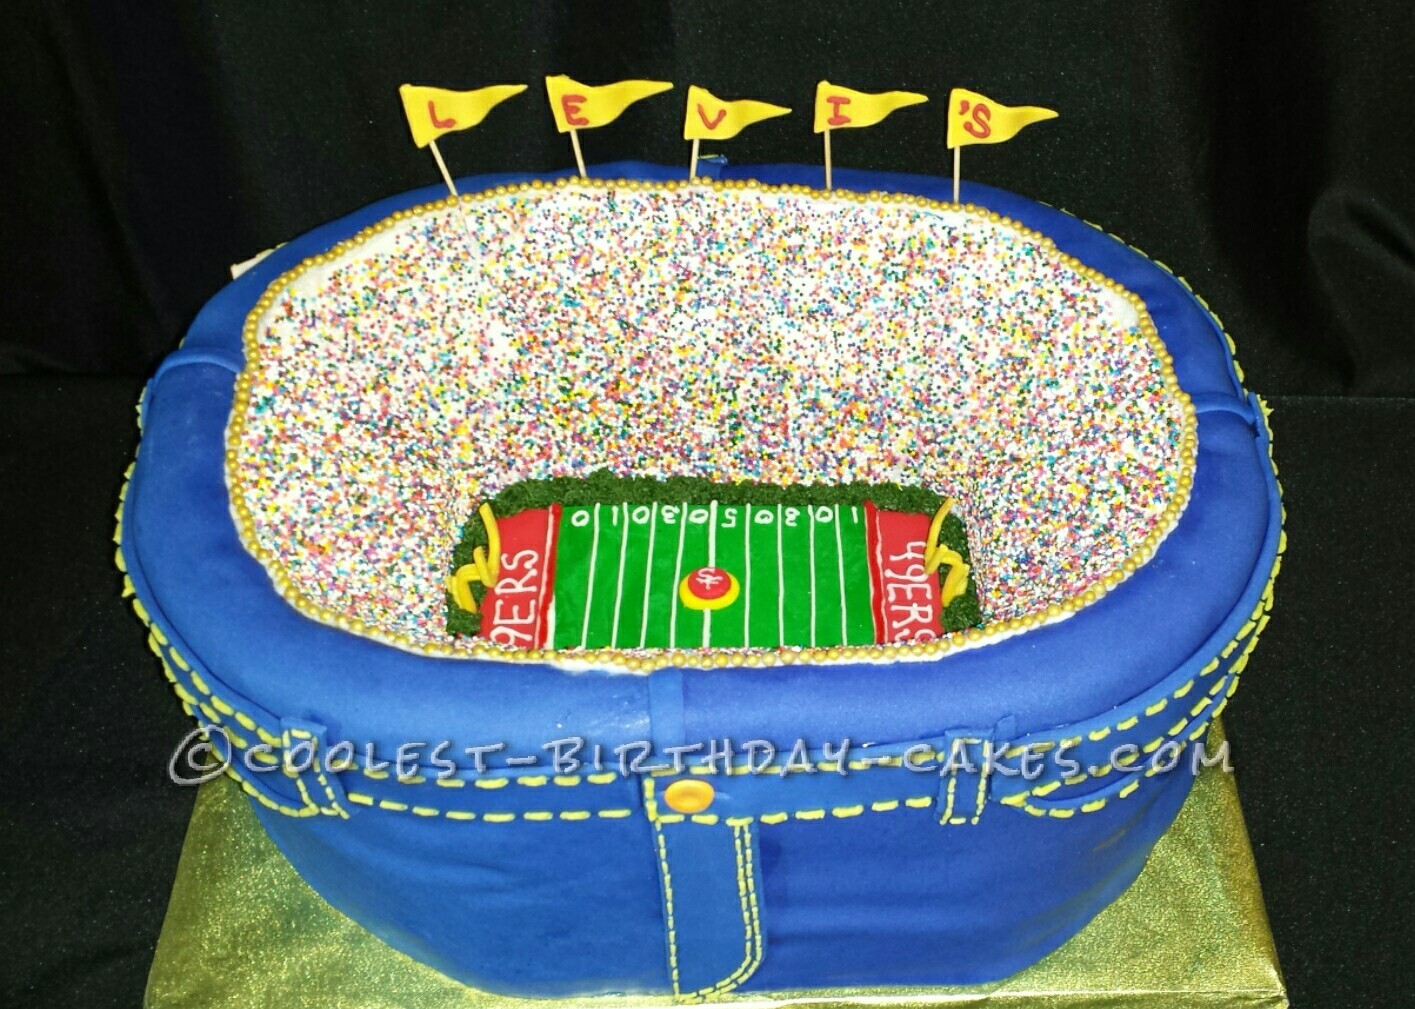 Coolest Football Stadium Cake